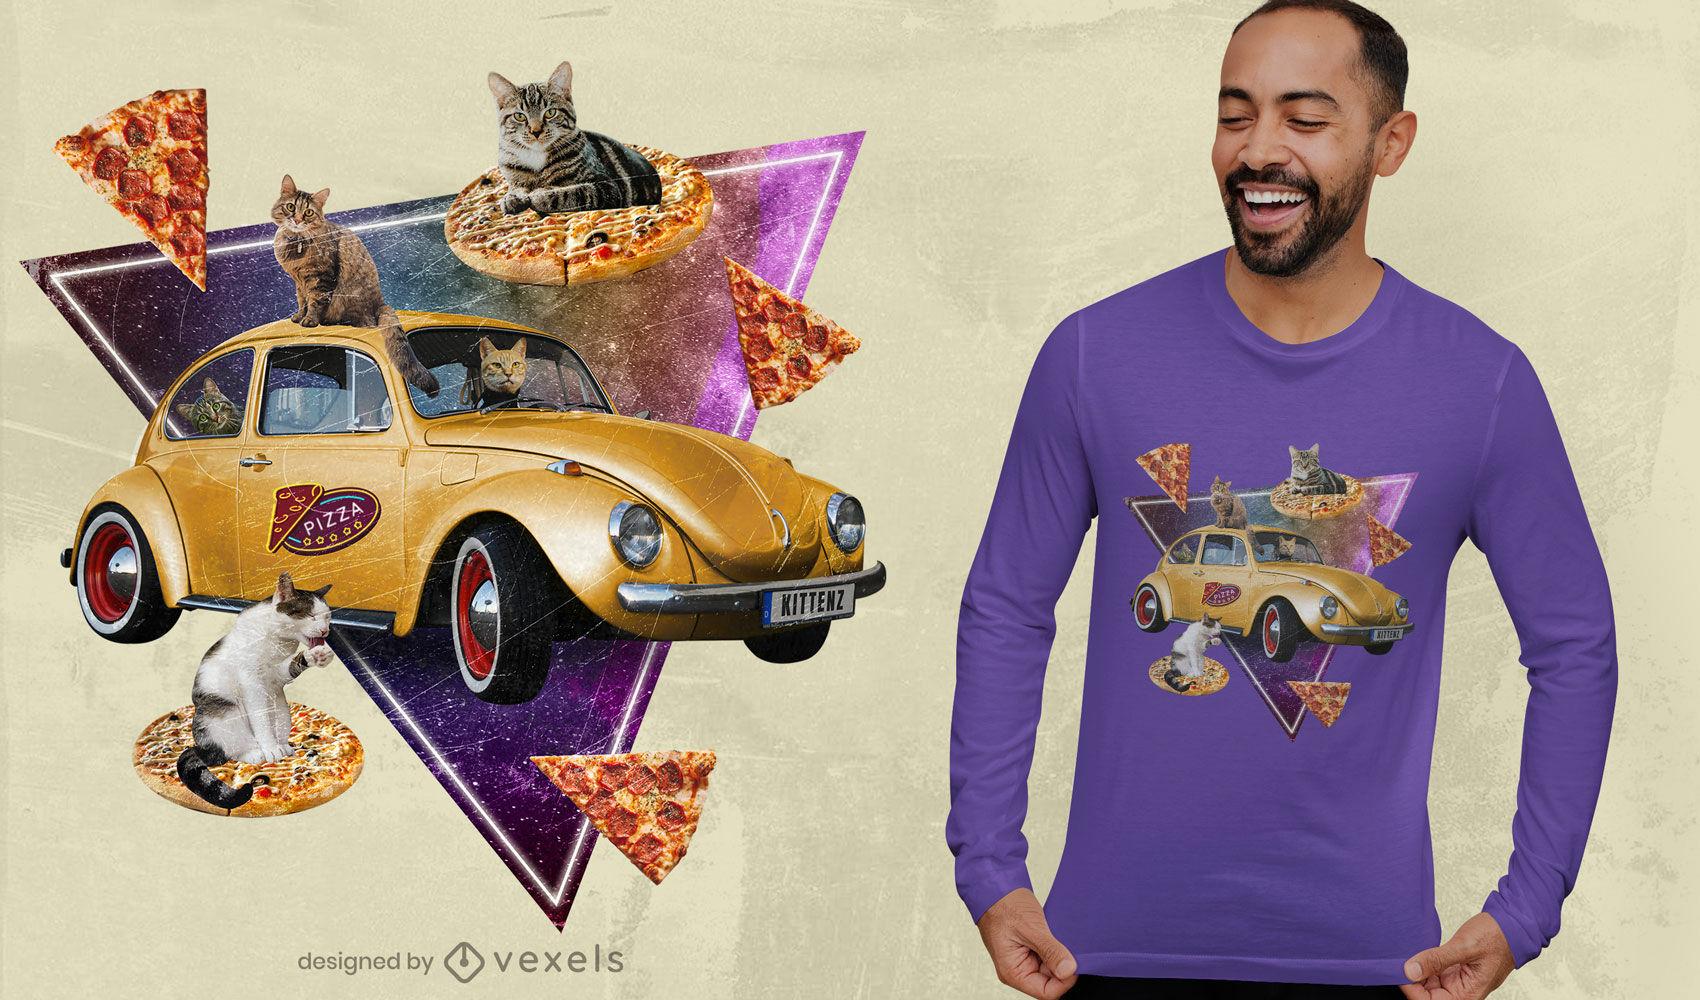 Katze Pizza Auto Fotocollage T-Shirt PSD